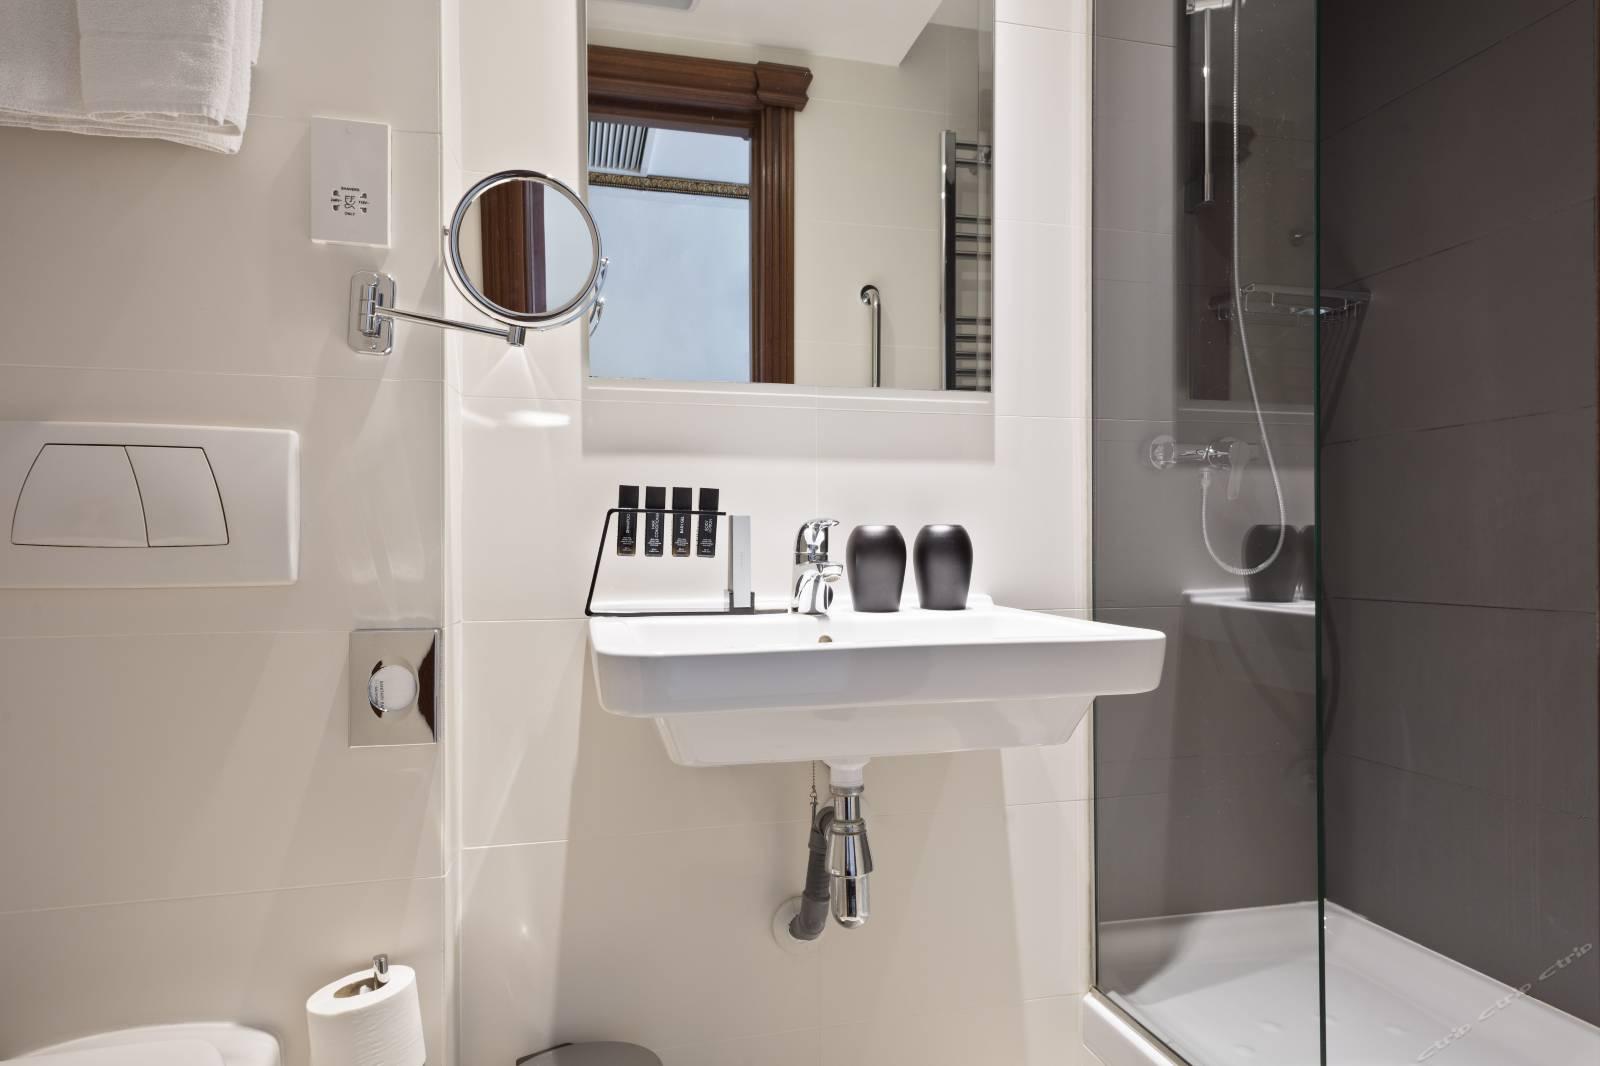 fashion oval ceramic basin order now for washroom-16